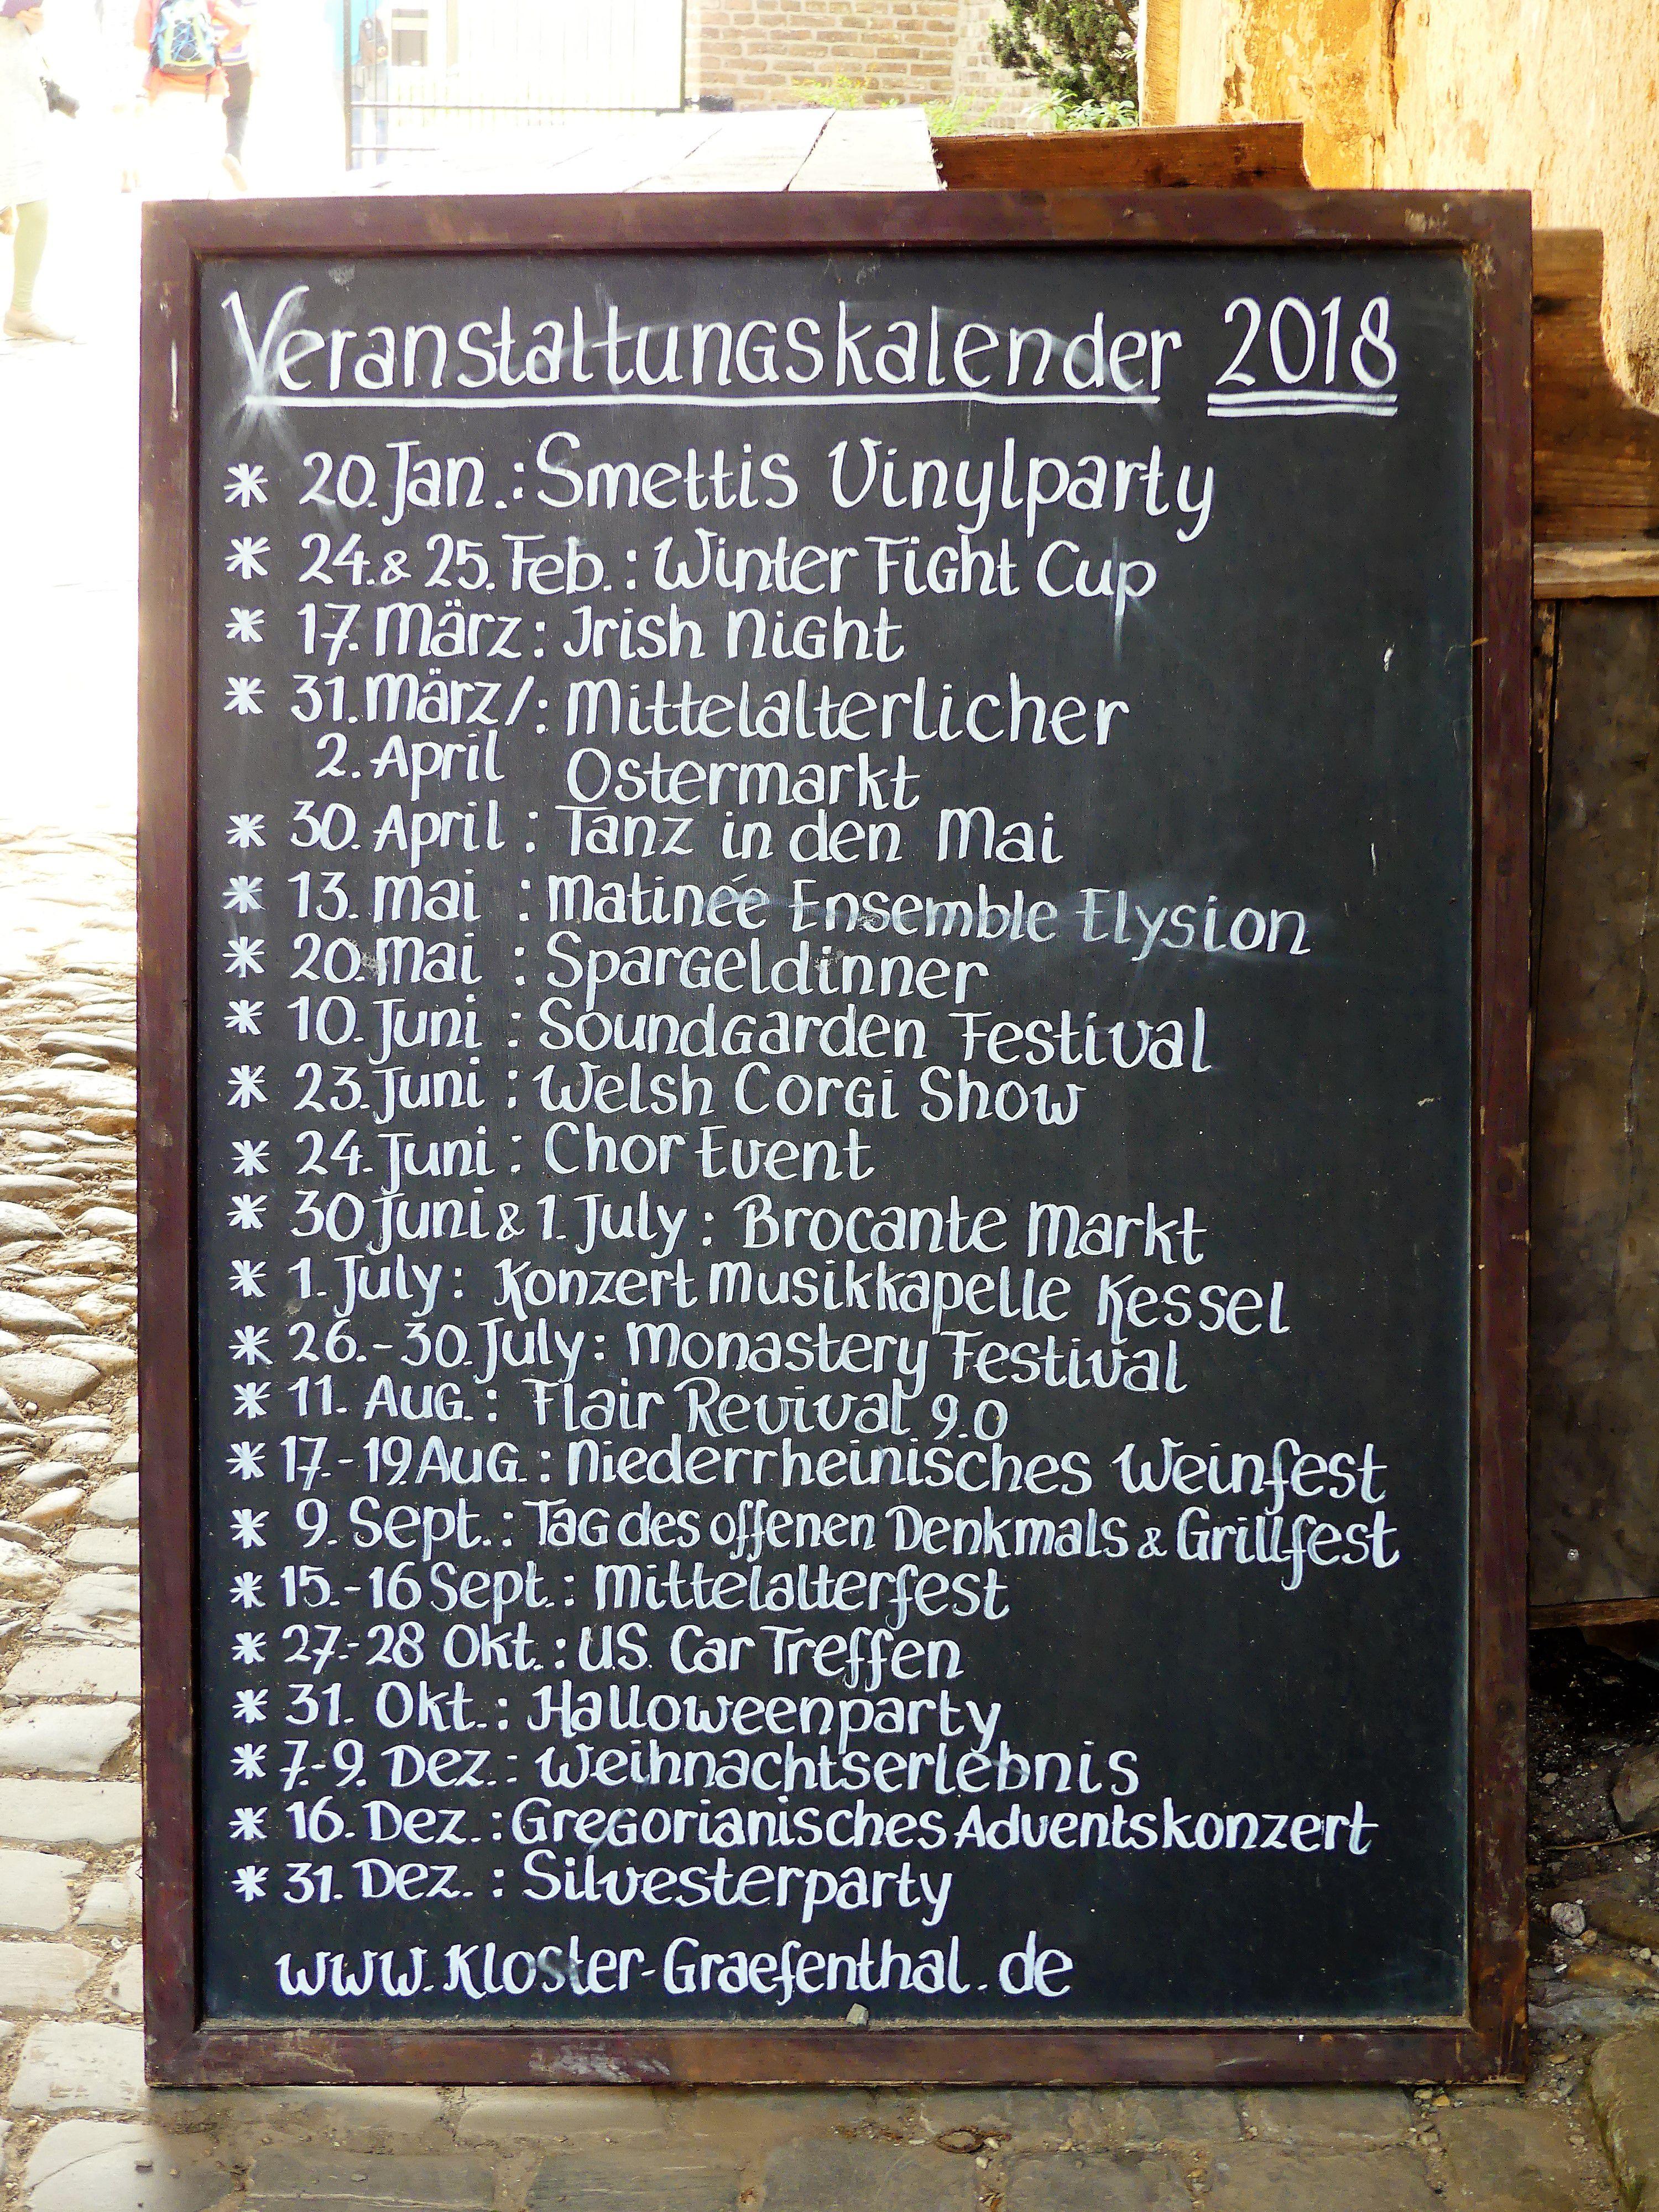 Evenementen in Klooster Graefenthal.